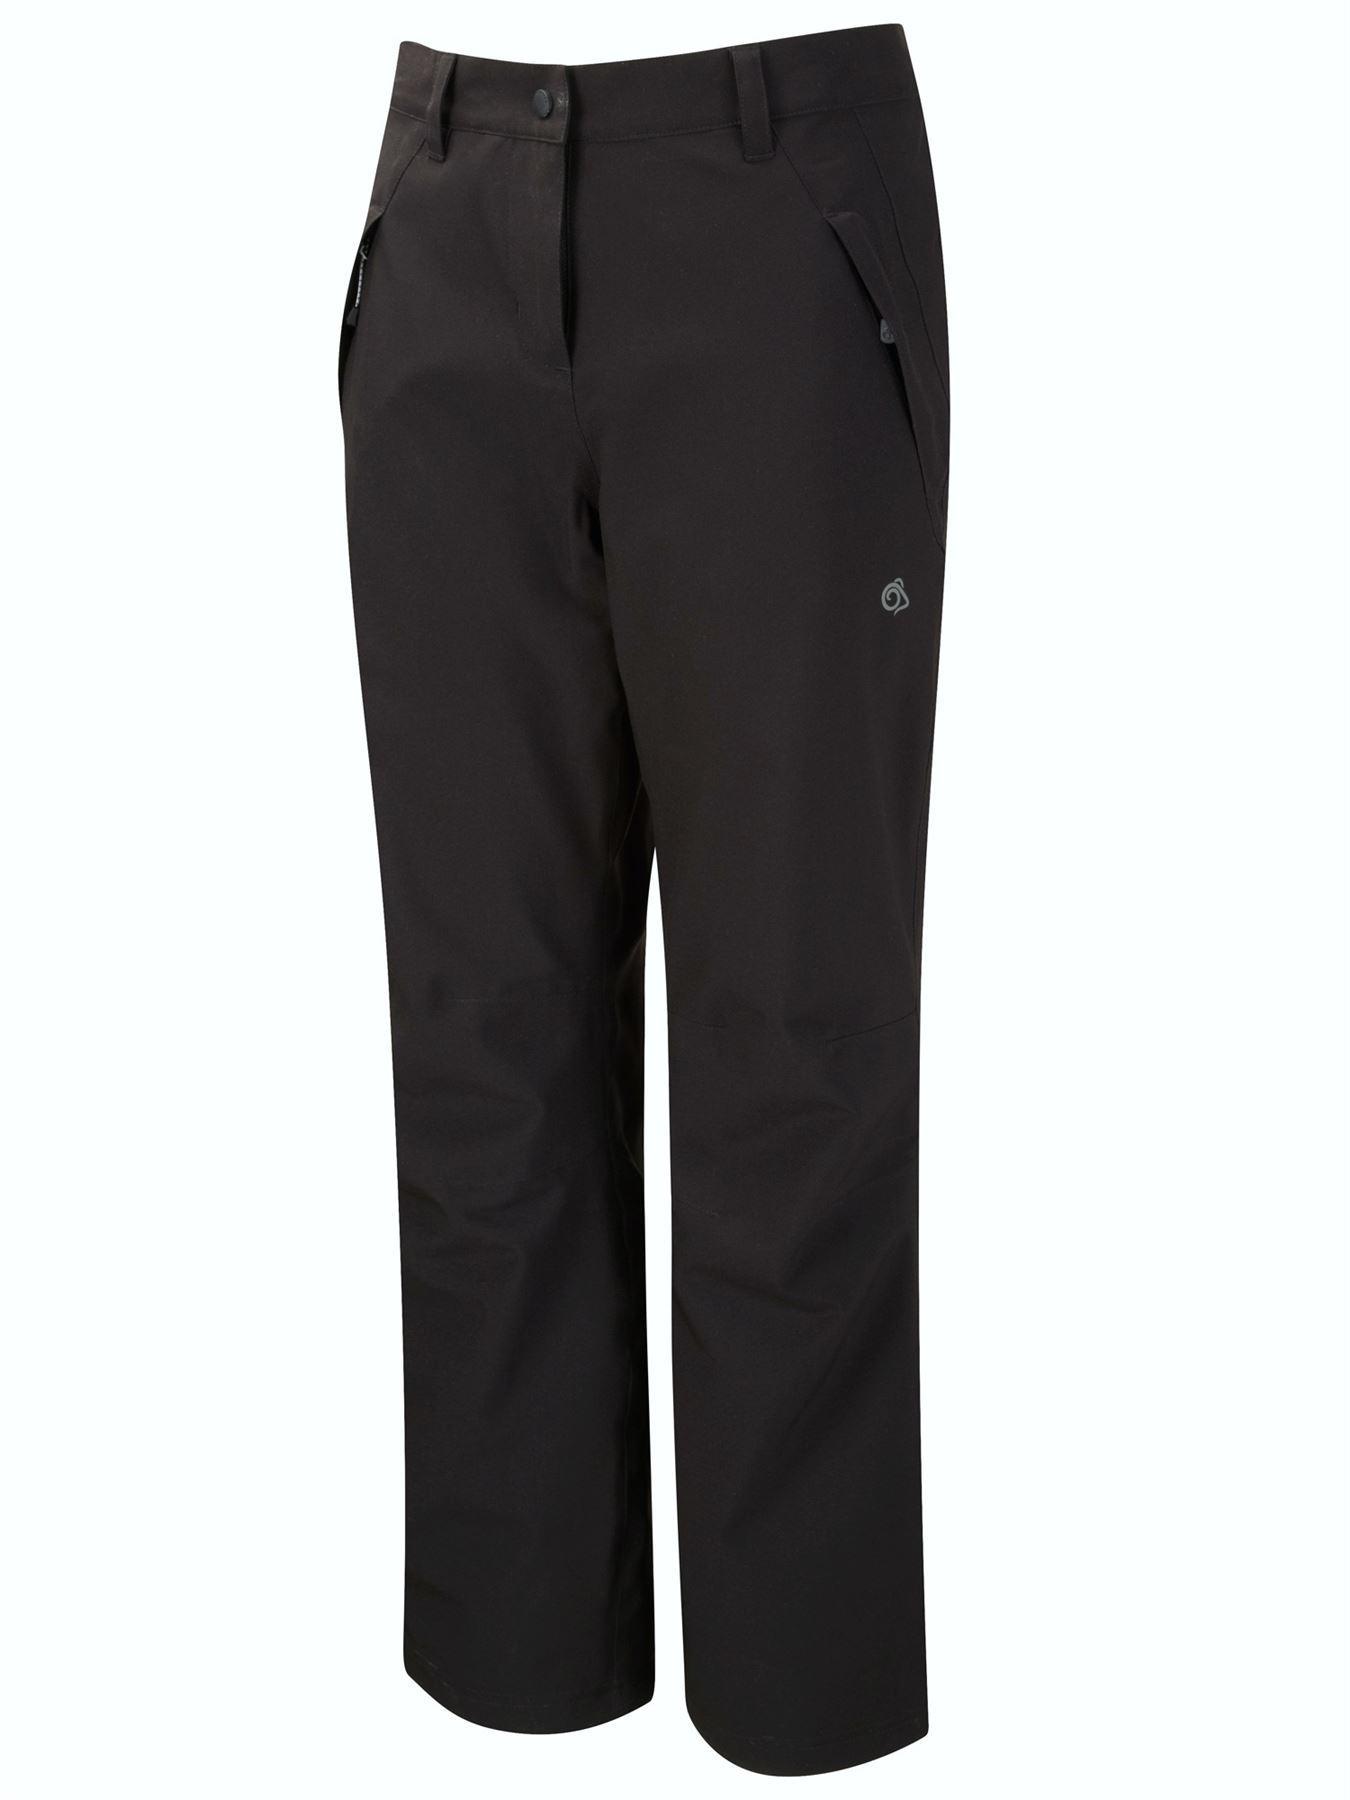 miniatuur 5 - Craghoppers Womens Aysgarth Waterproof Stretch Trousers